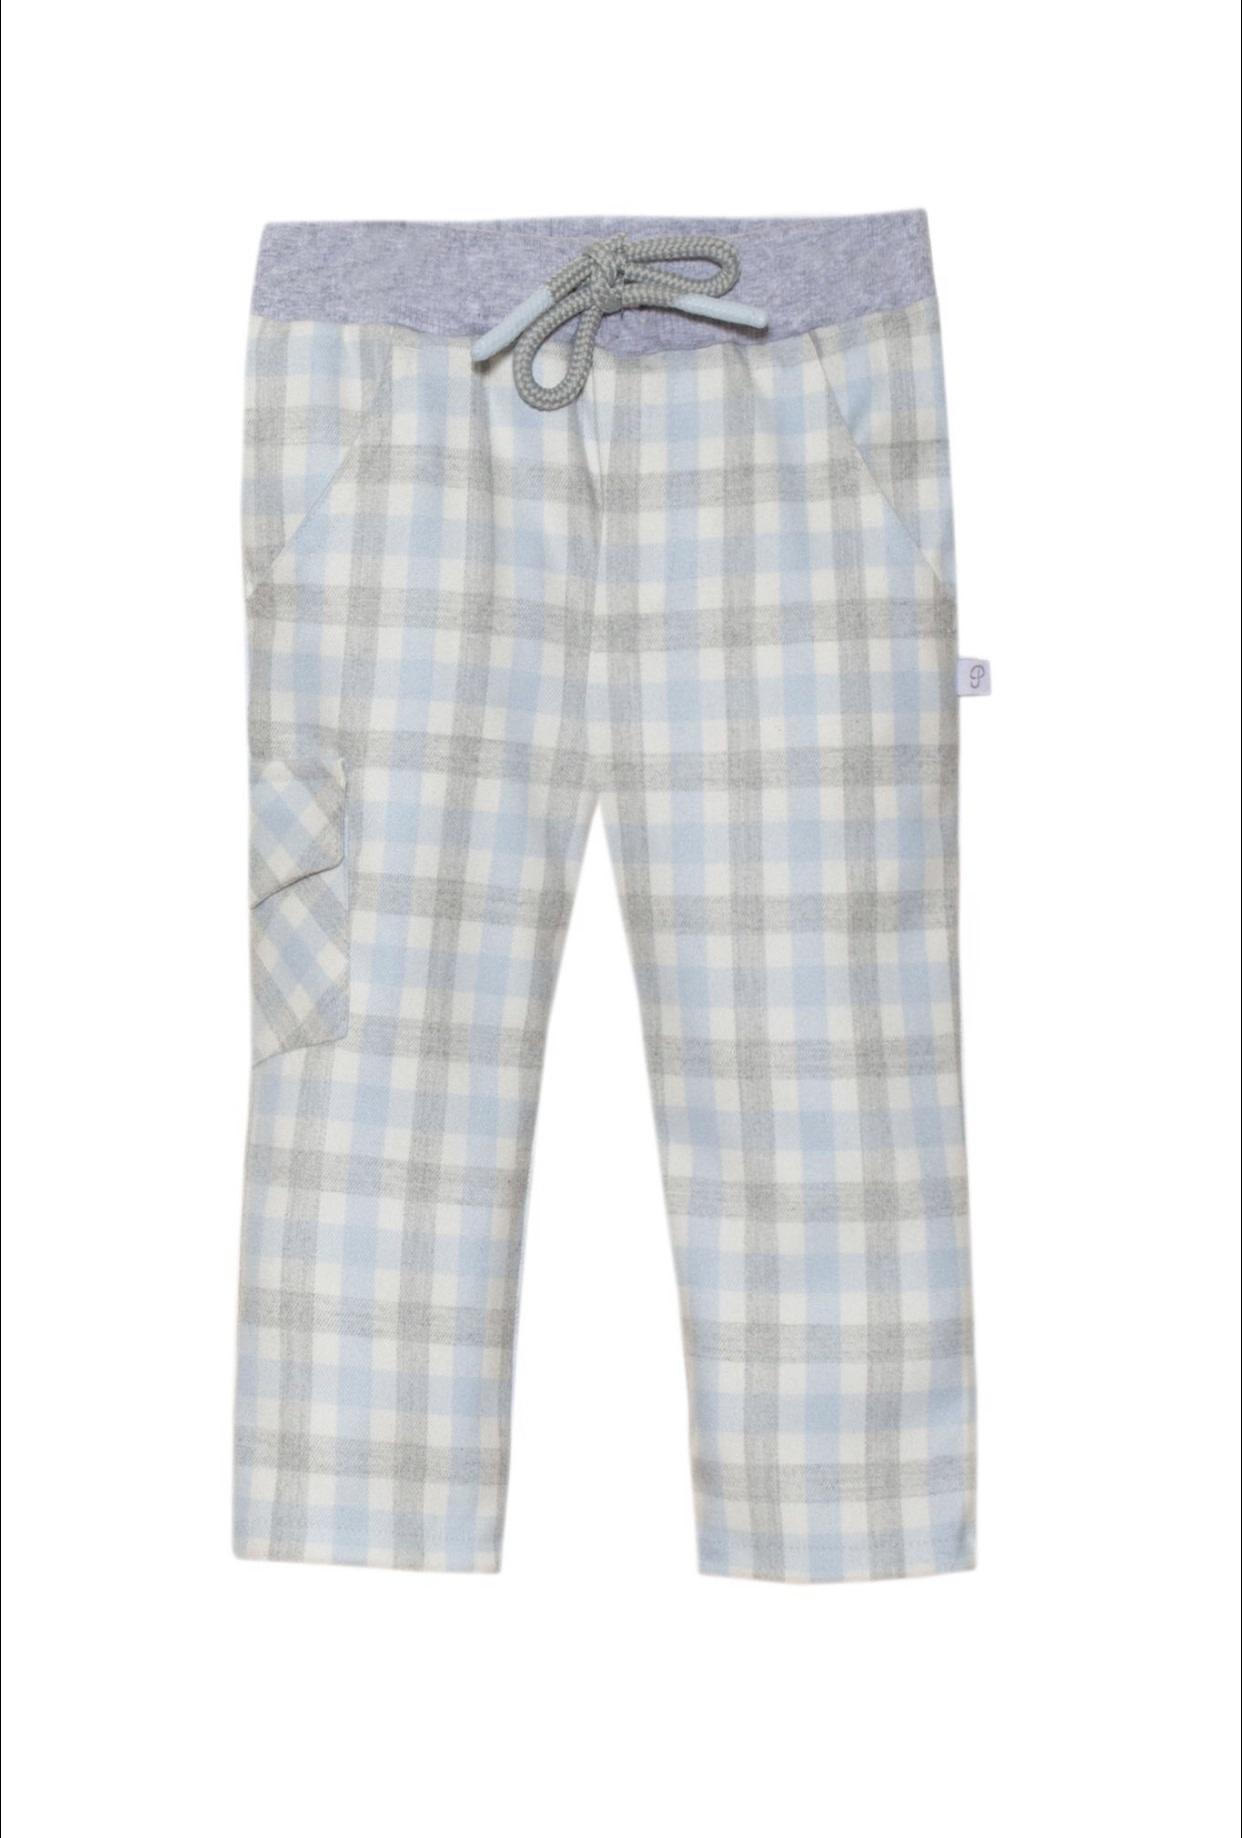 Patachou Patachou Winter White polo shirt & Check Trousers